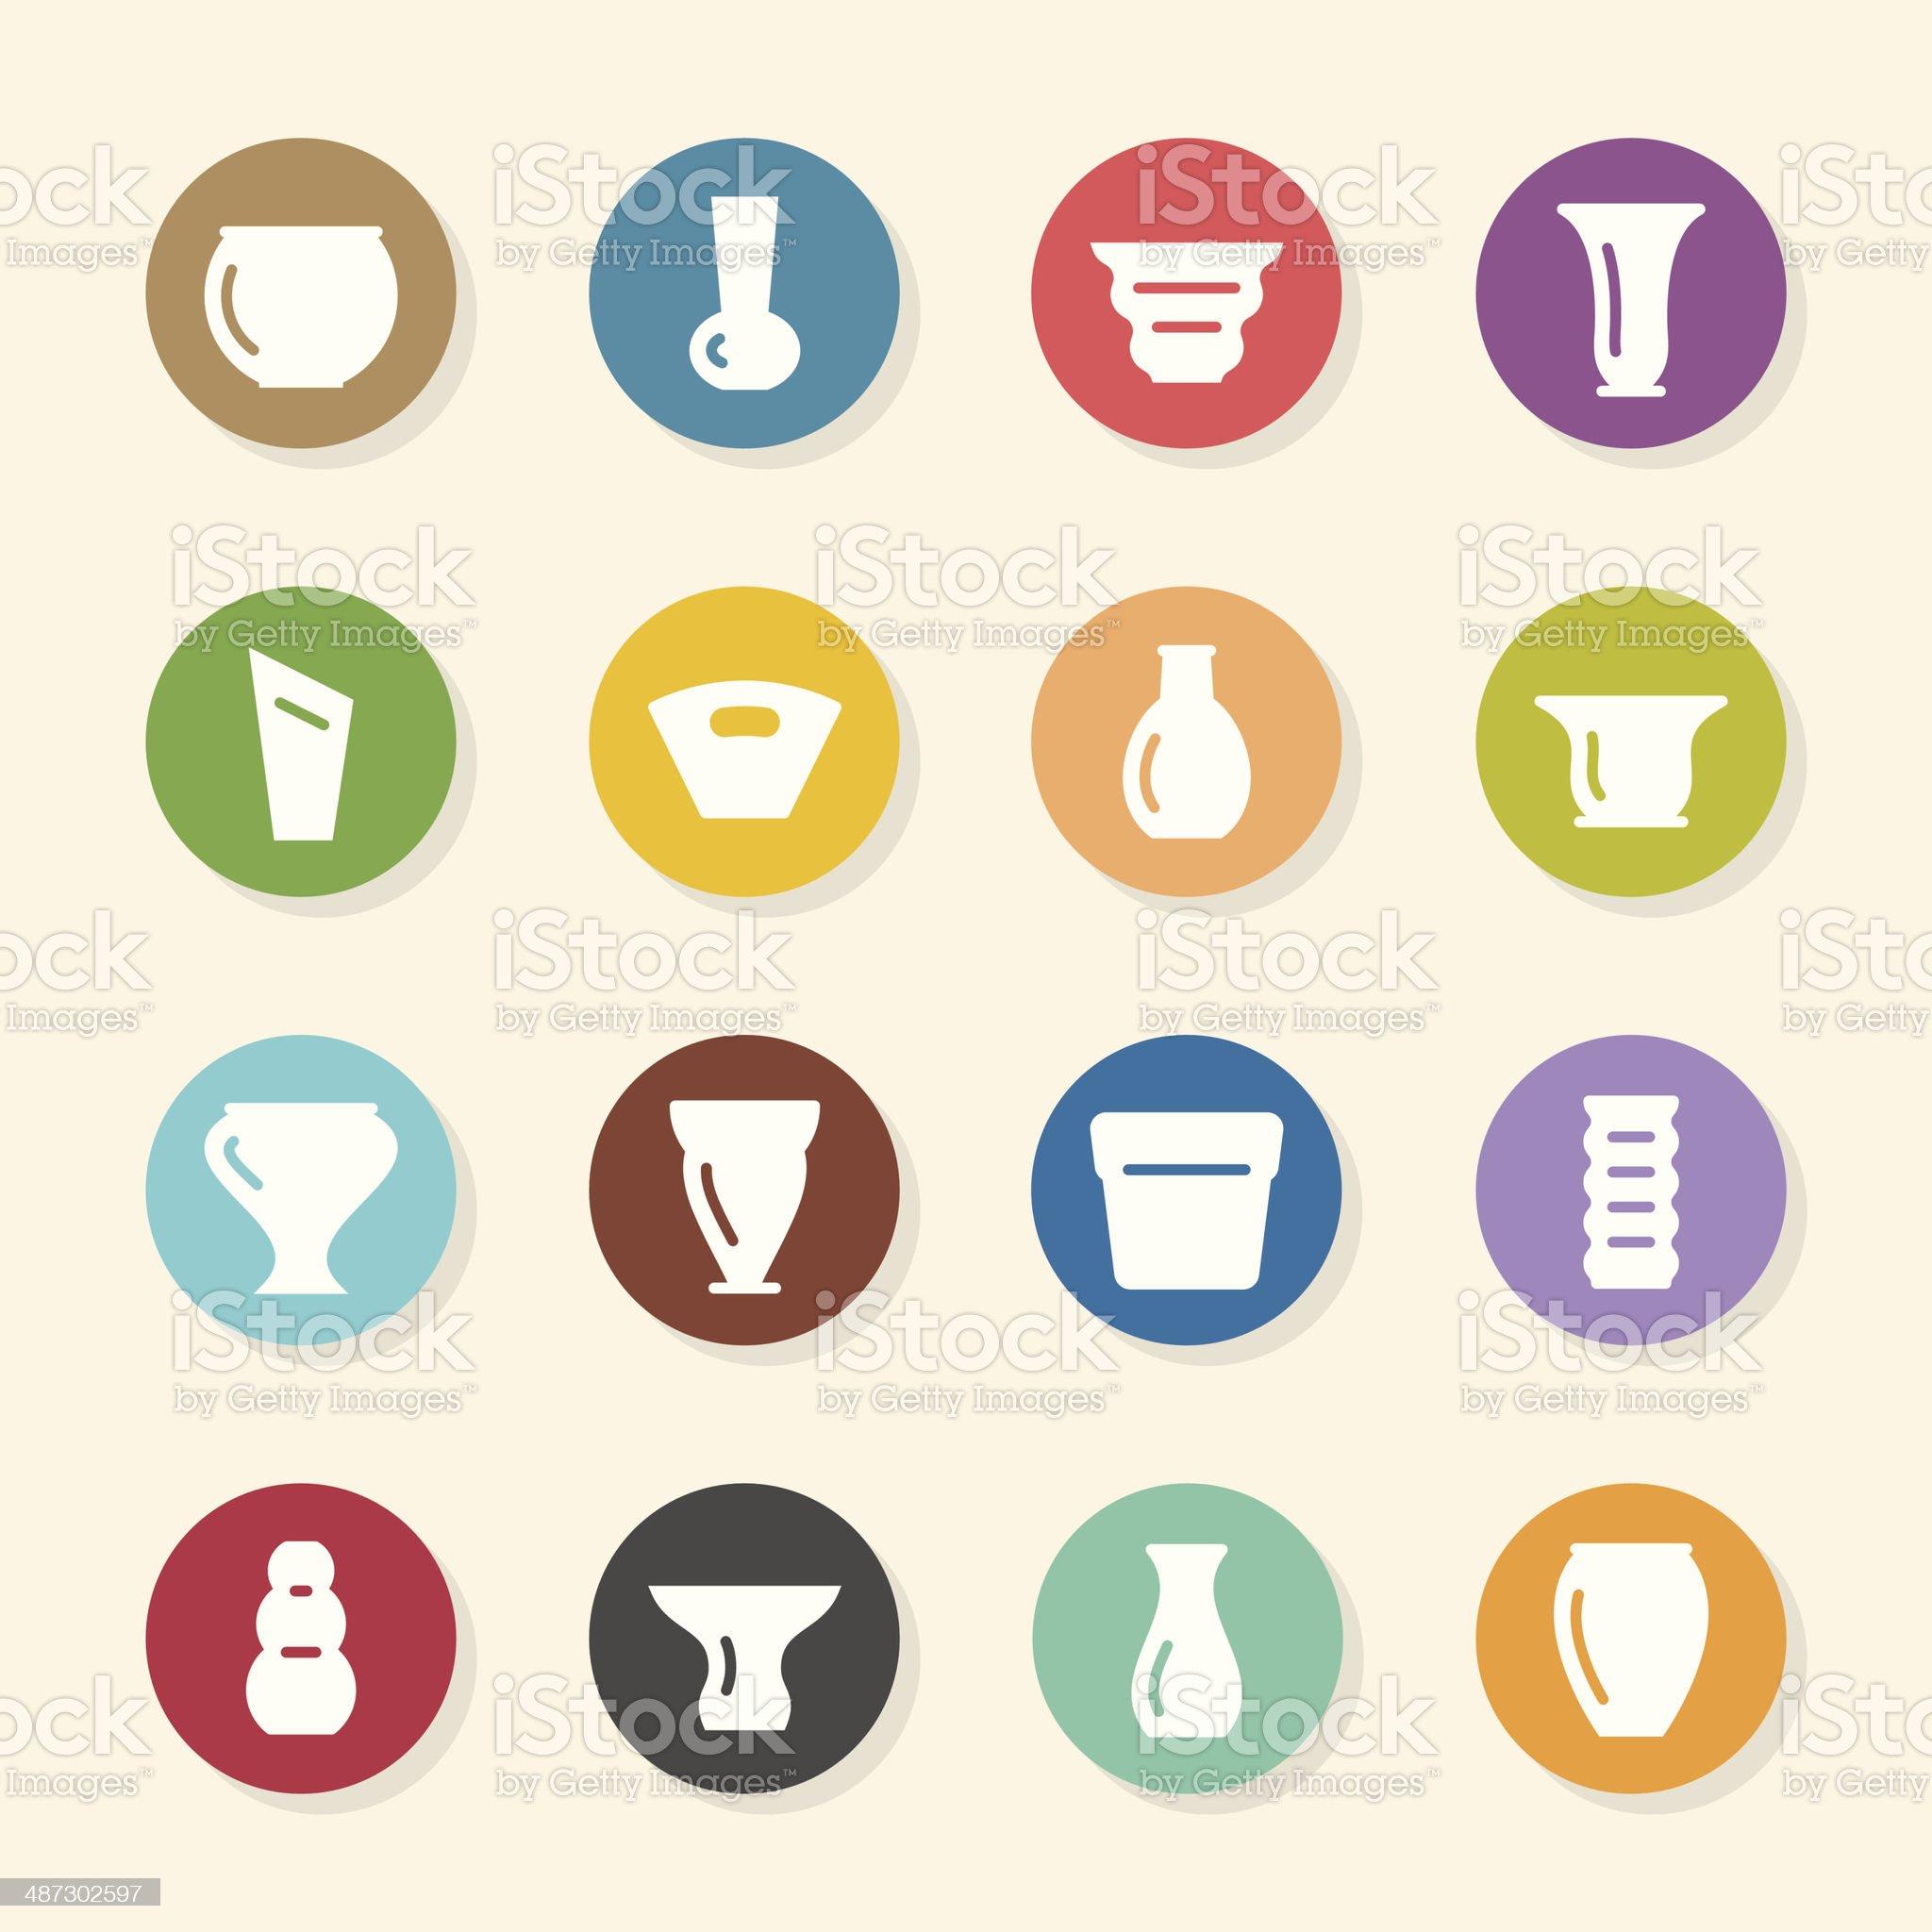 Pot and Vase Icons Set 1 - Color Circle Series royalty-free stock vector art